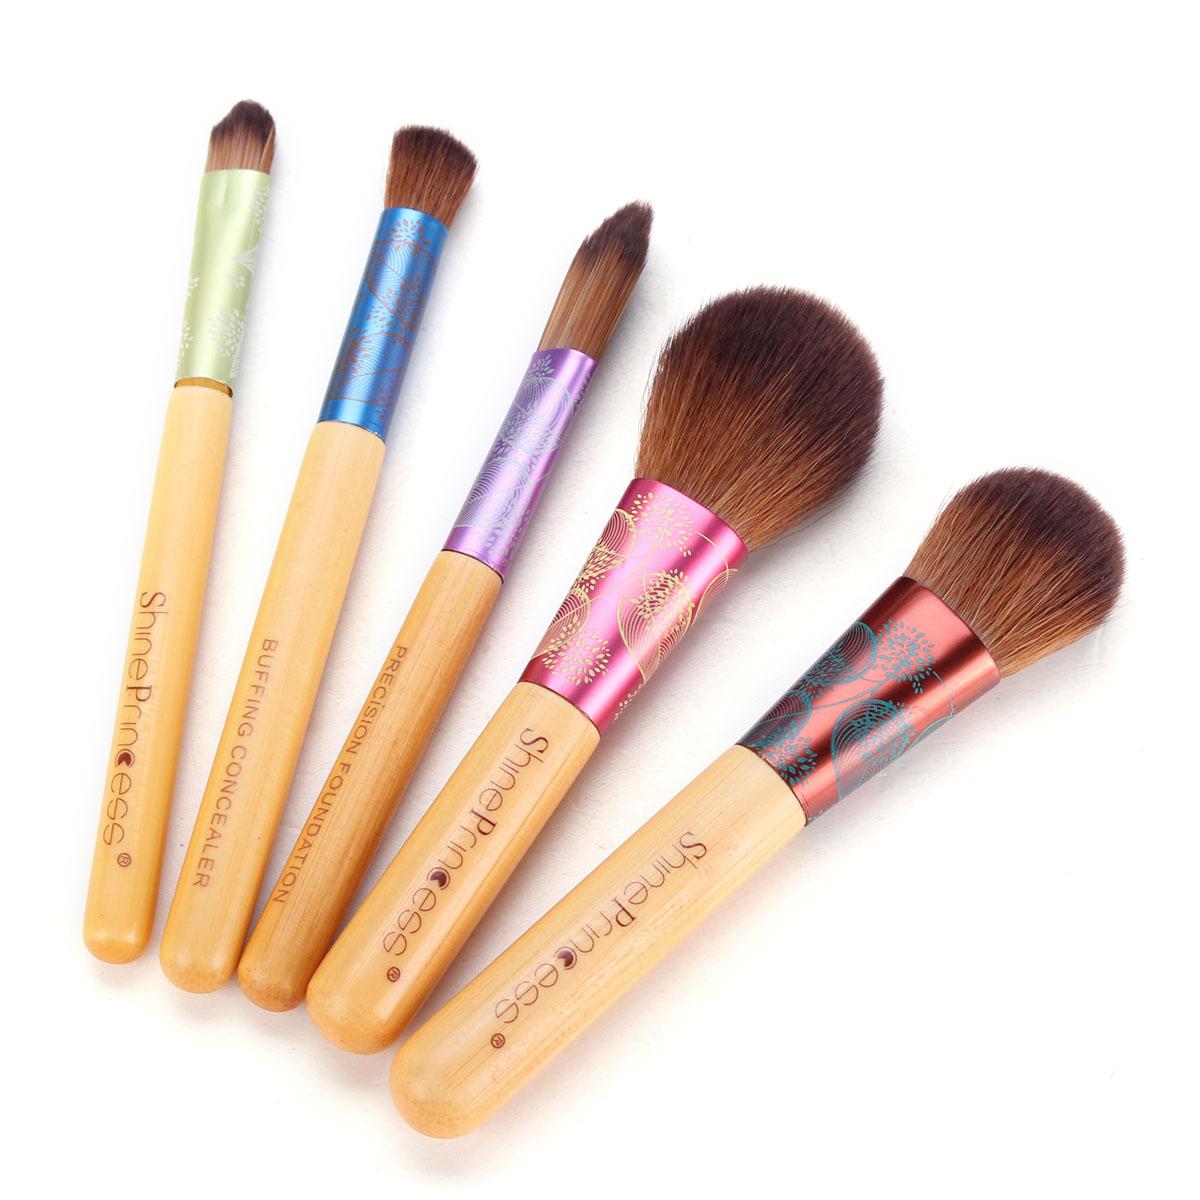 Pro 5Pcs/Set Bamboo Makeup Brush Sets Girls Cosmetic Blush Foundation Powder Brushes Kit Beauty Tools High Quality(China (Mainland))